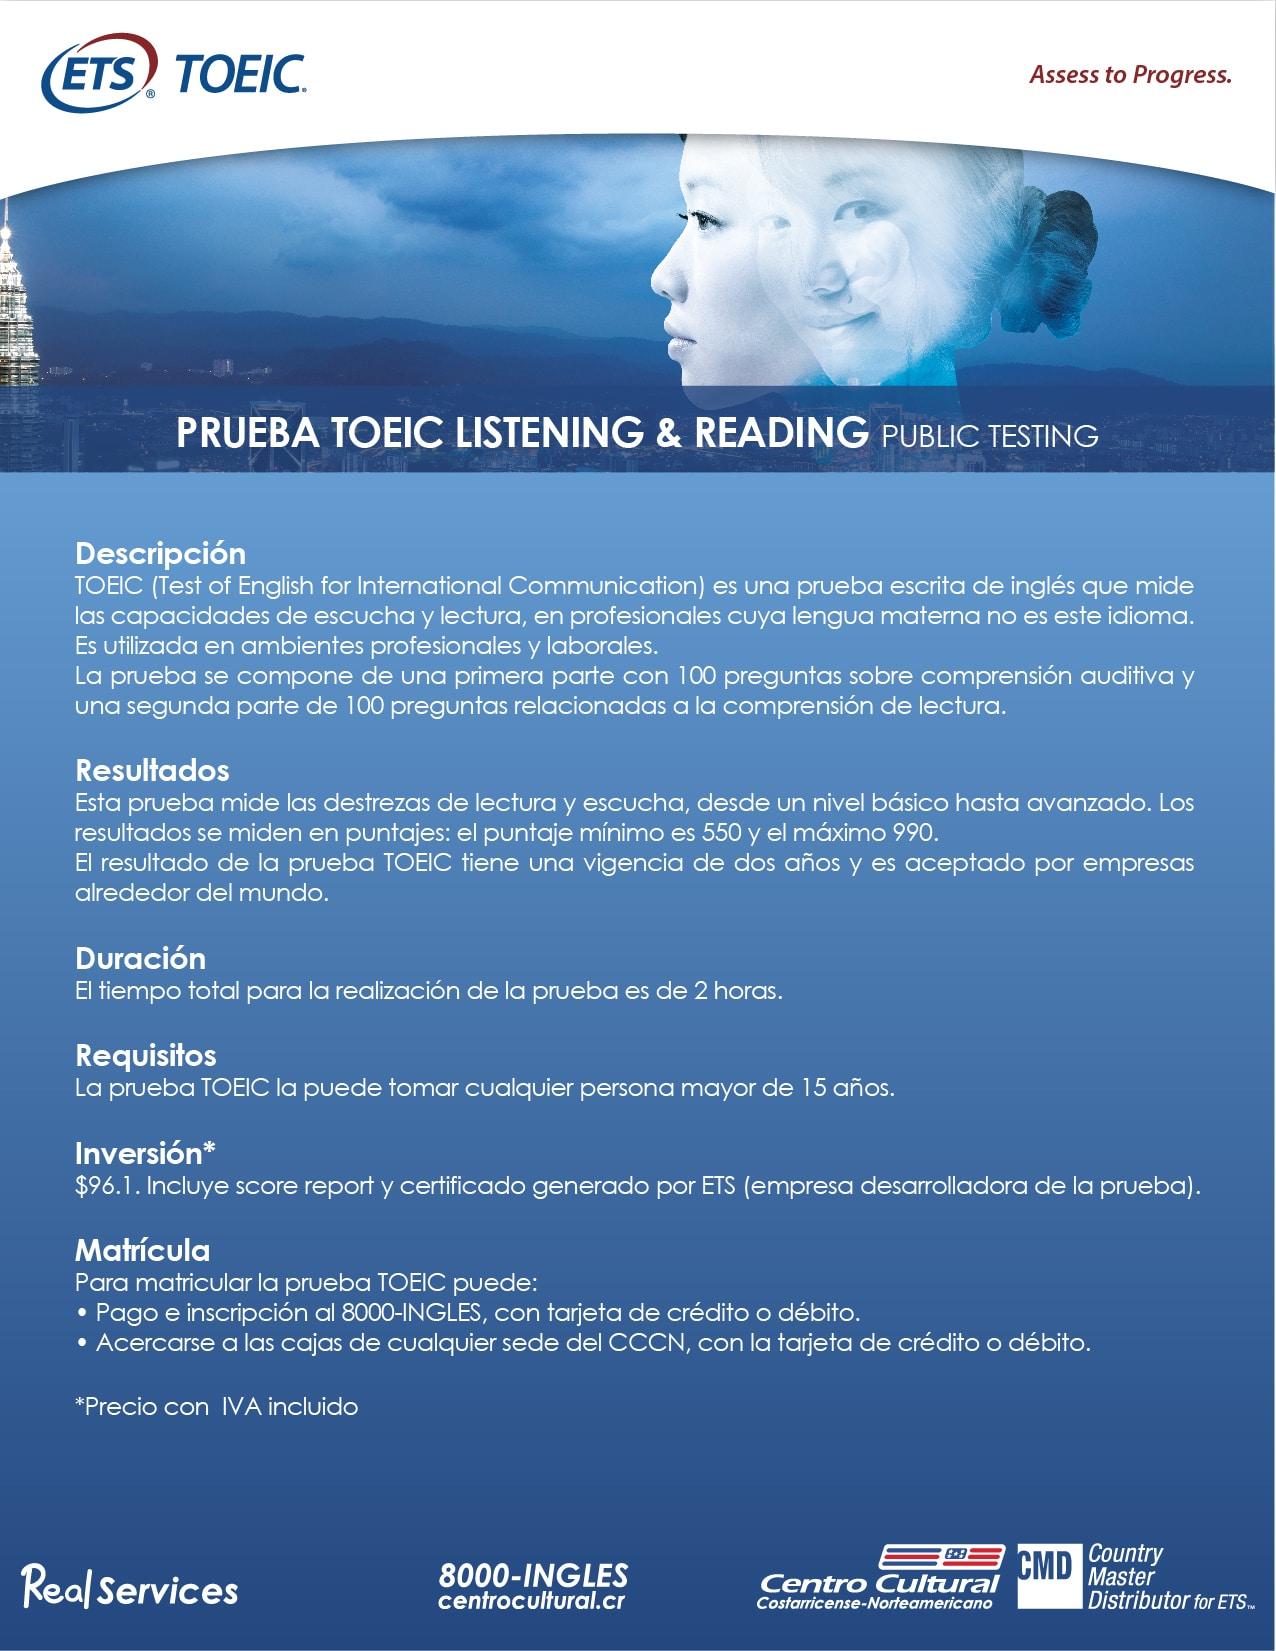 FICHA PRUEBA TOEIC L&R PUBLIC TESTING (1)